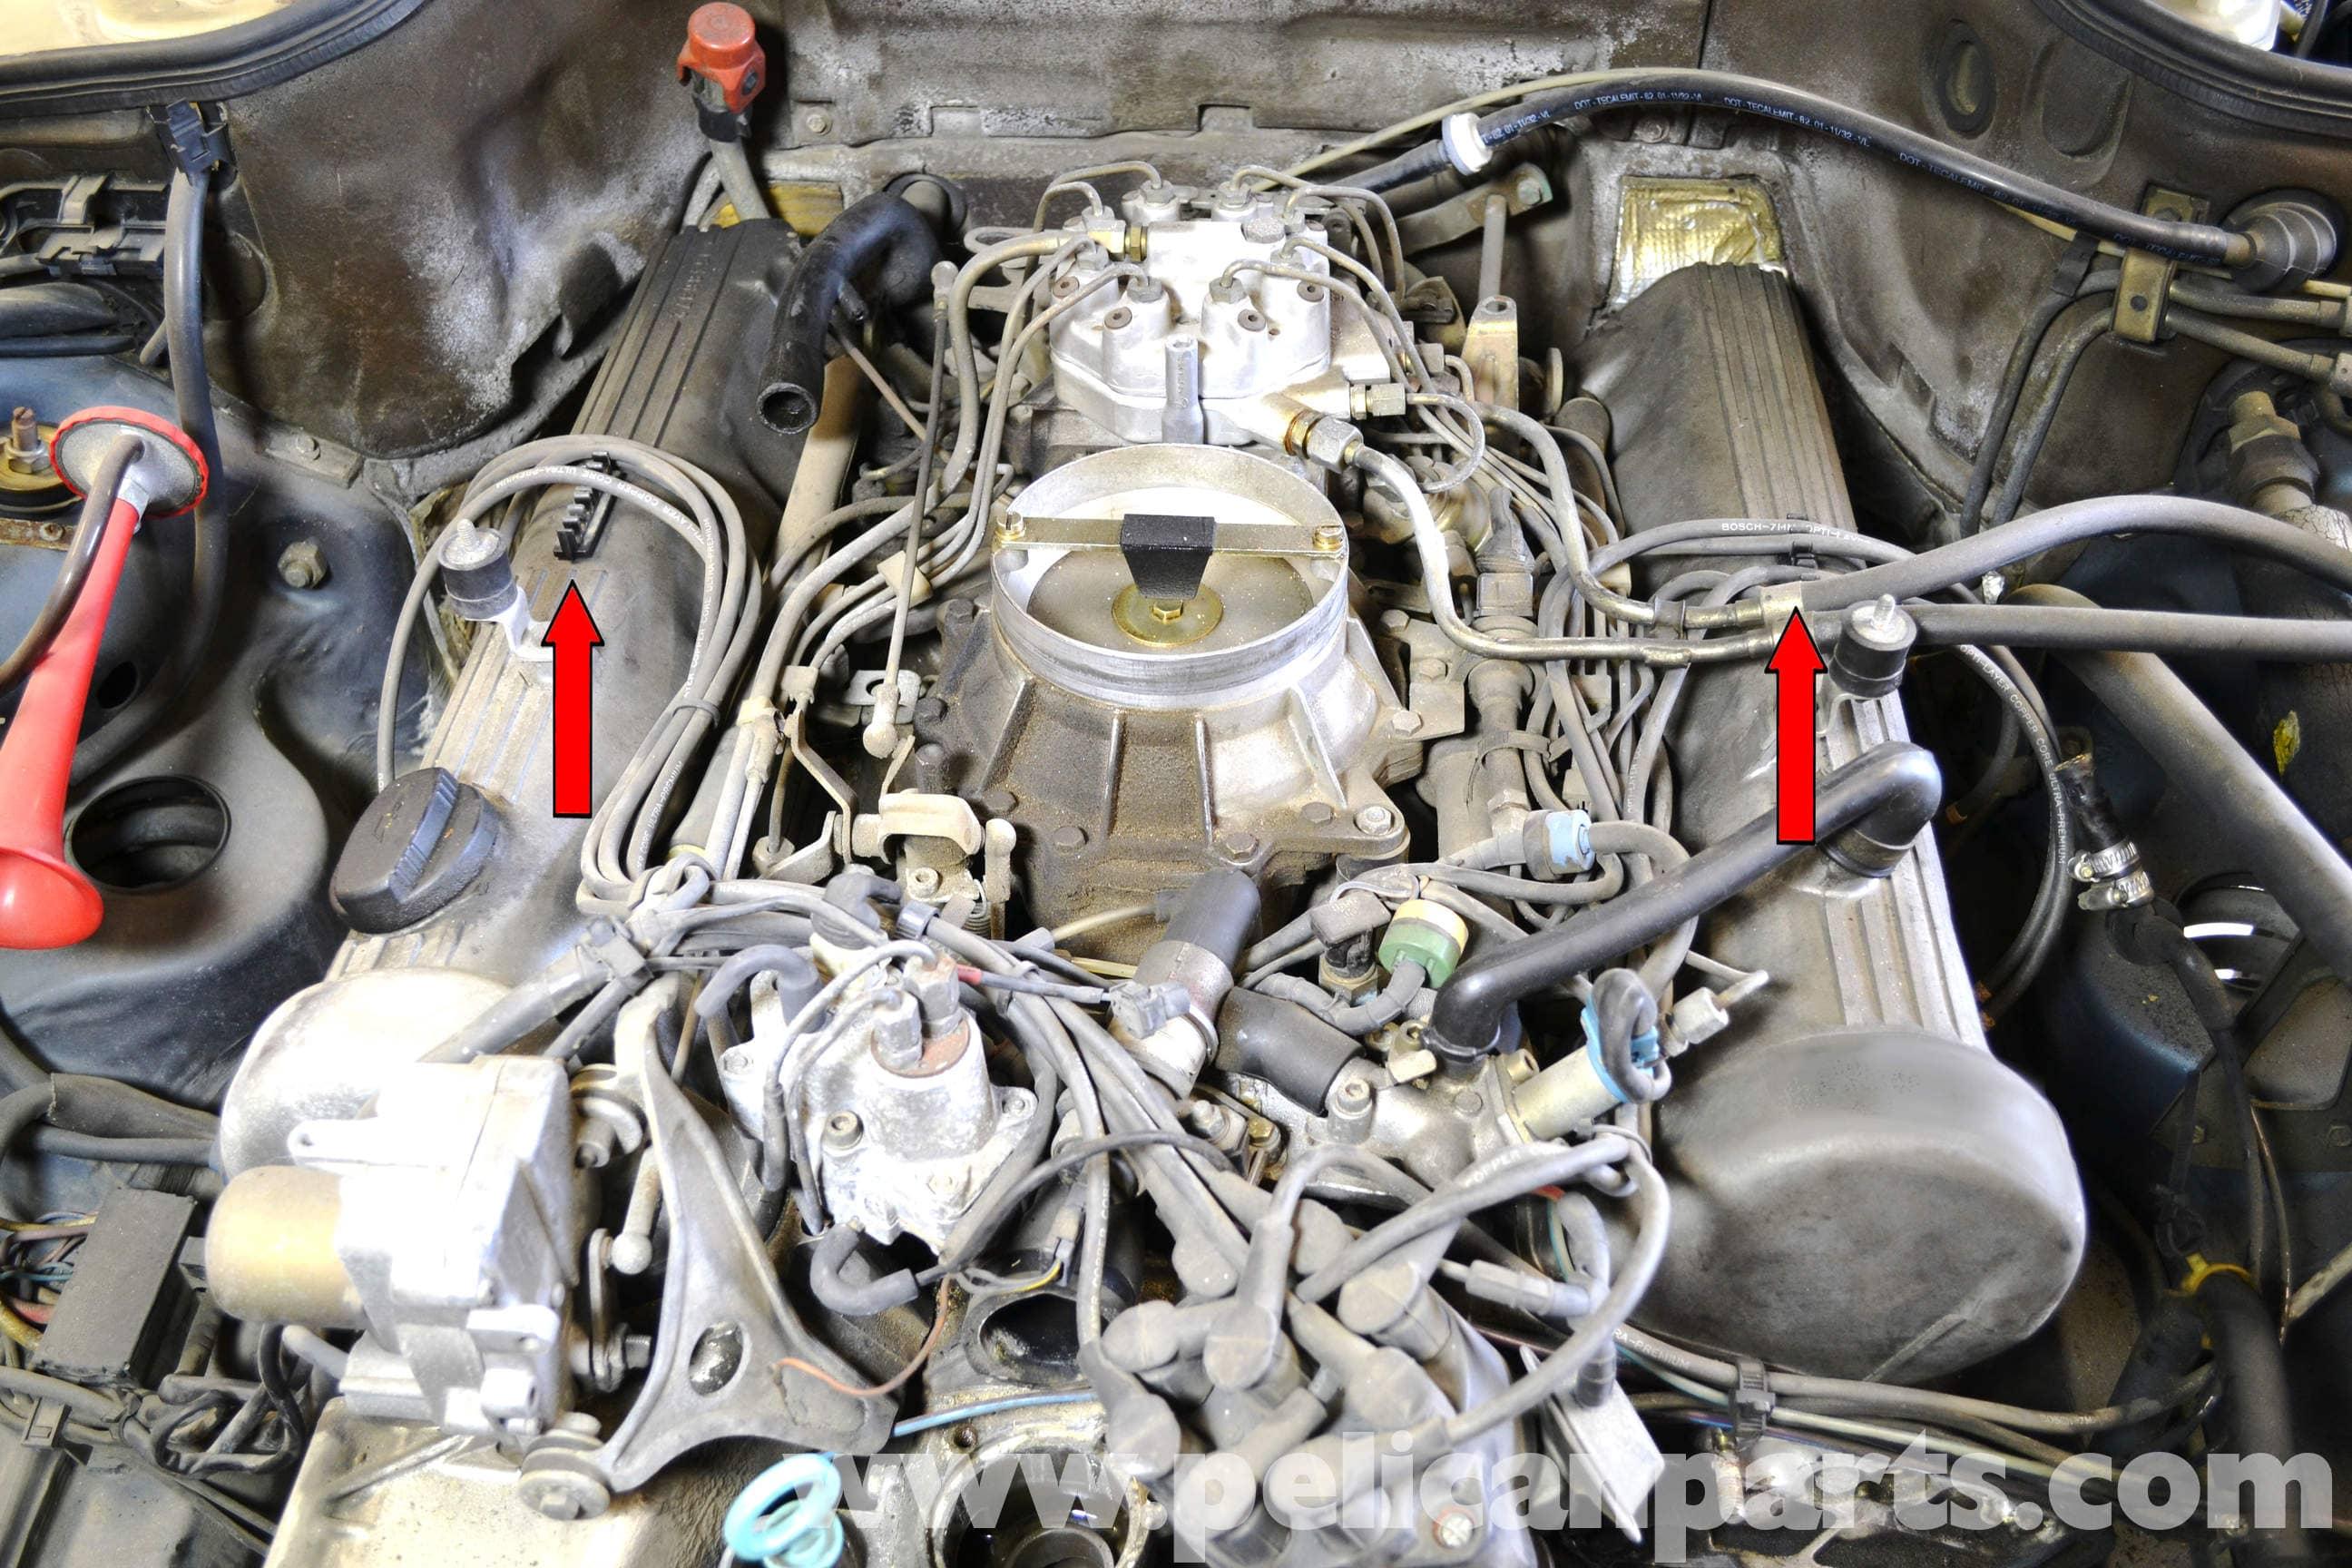 Superb 1980 Mercedes 450Sl Wiring Diagrams Online Wiring Diagram Wiring Cloud Ittabisraaidewilluminateatxorg